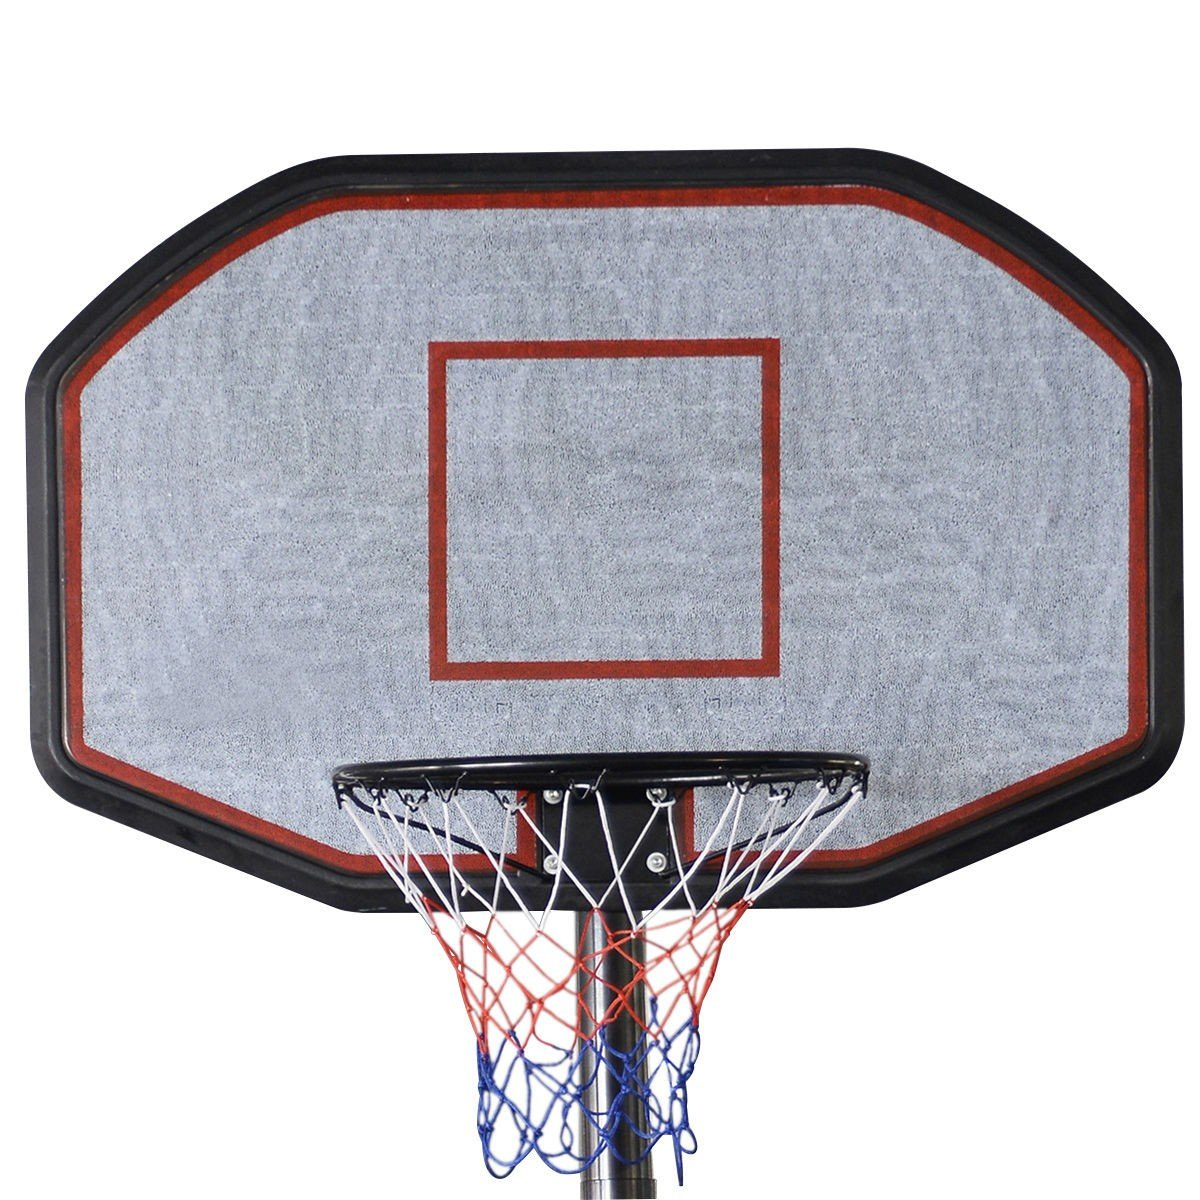 USA_BEST_SELLER Indoor Outdoor Adjustable Height Basketball Hoop Backboard with Wheels by USA_BEST_SELLER (Image #4)